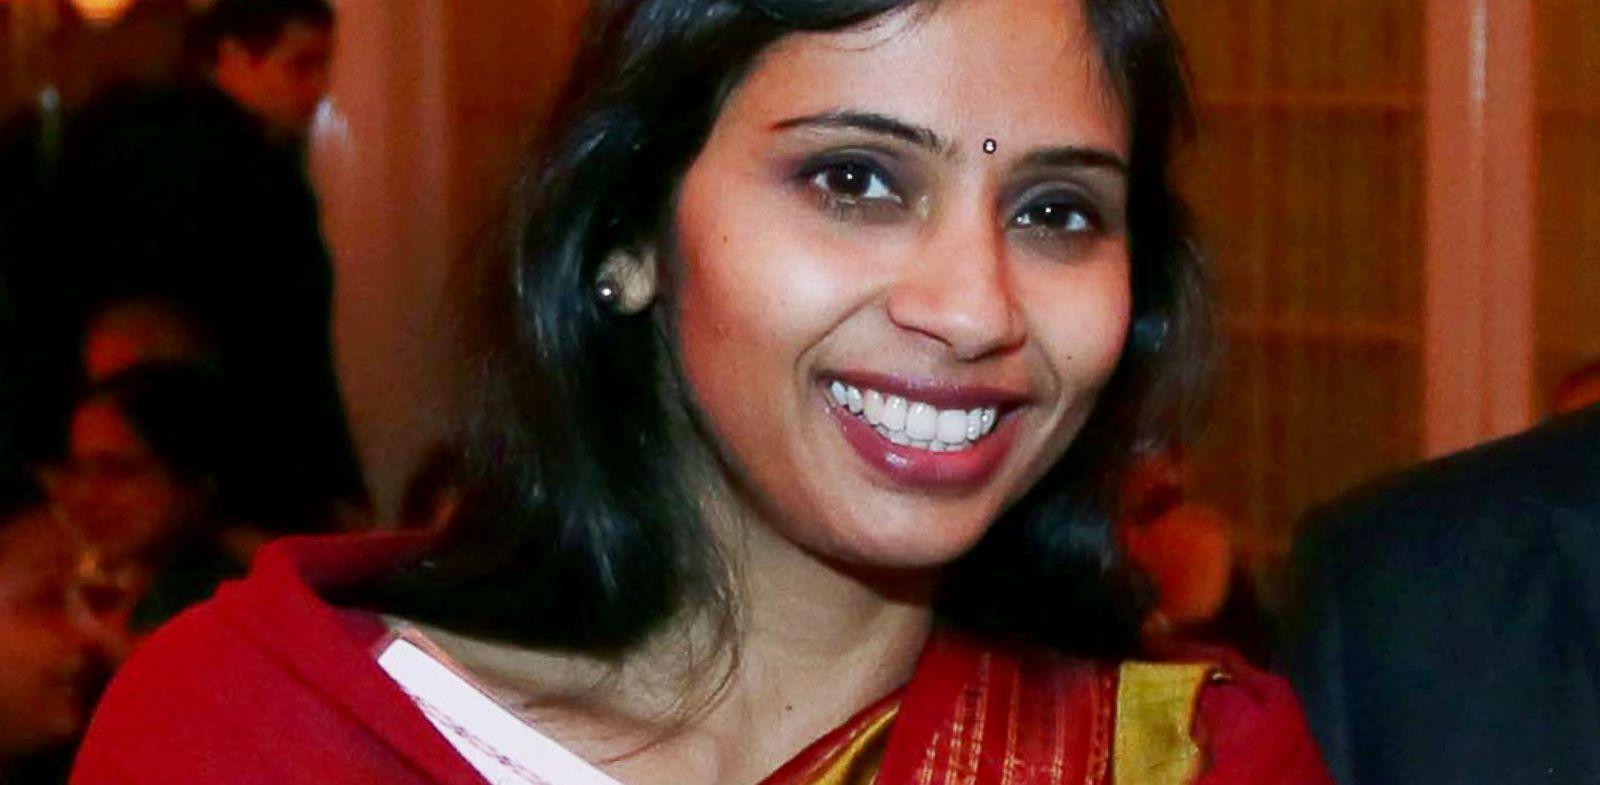 PHOTO: Devyani Khobragade, Indias deputy consul general, attends the India Studies Stony Brook University fundraiser event in Long Island, New York, December 8, 2013.